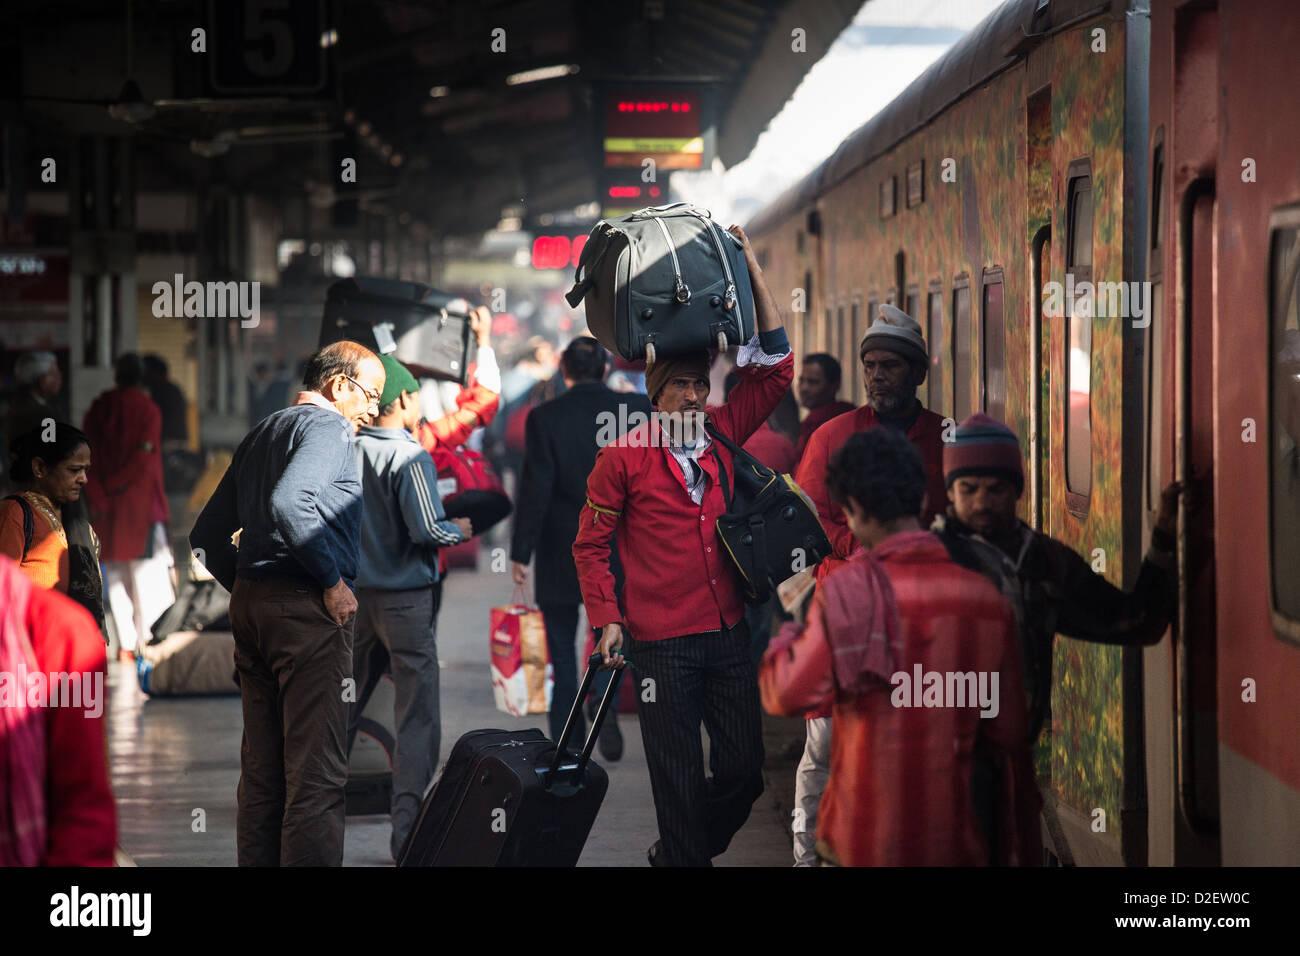 Railway station in Ahmedabad, India - Stock Image